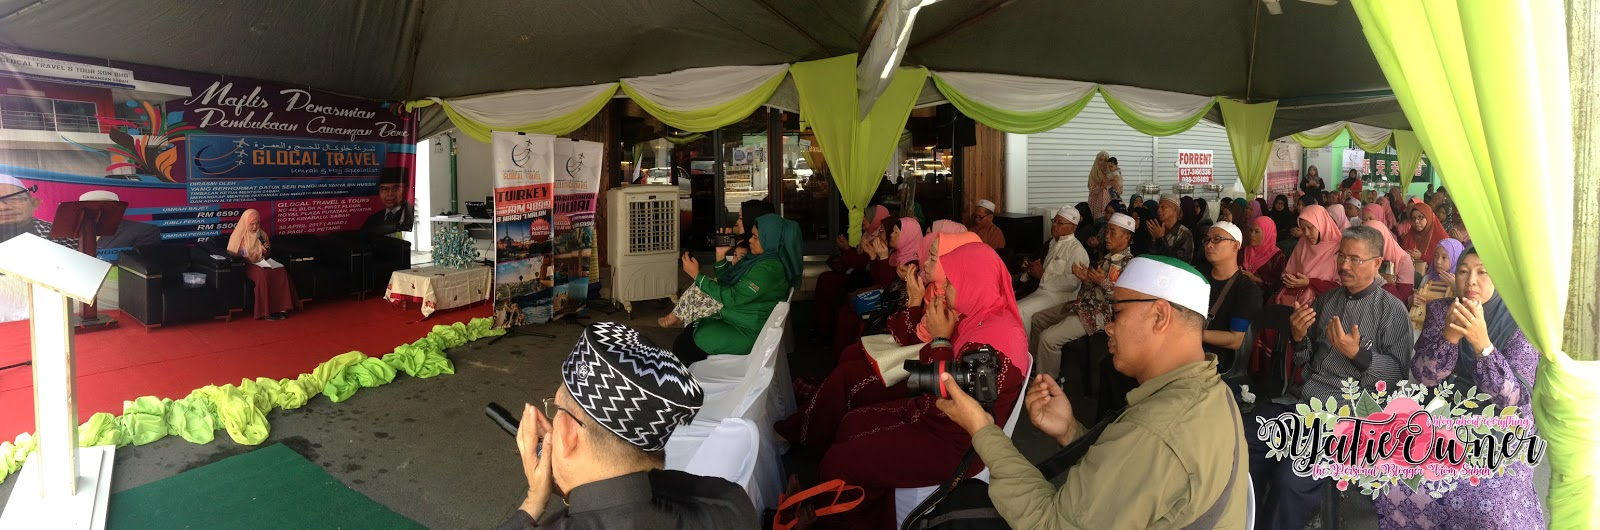 Majlis Perasmian Pembukaan Cawangan Baru Glocal Travel & Tours Sdn Bhd Kota Kinabalu, Sabah